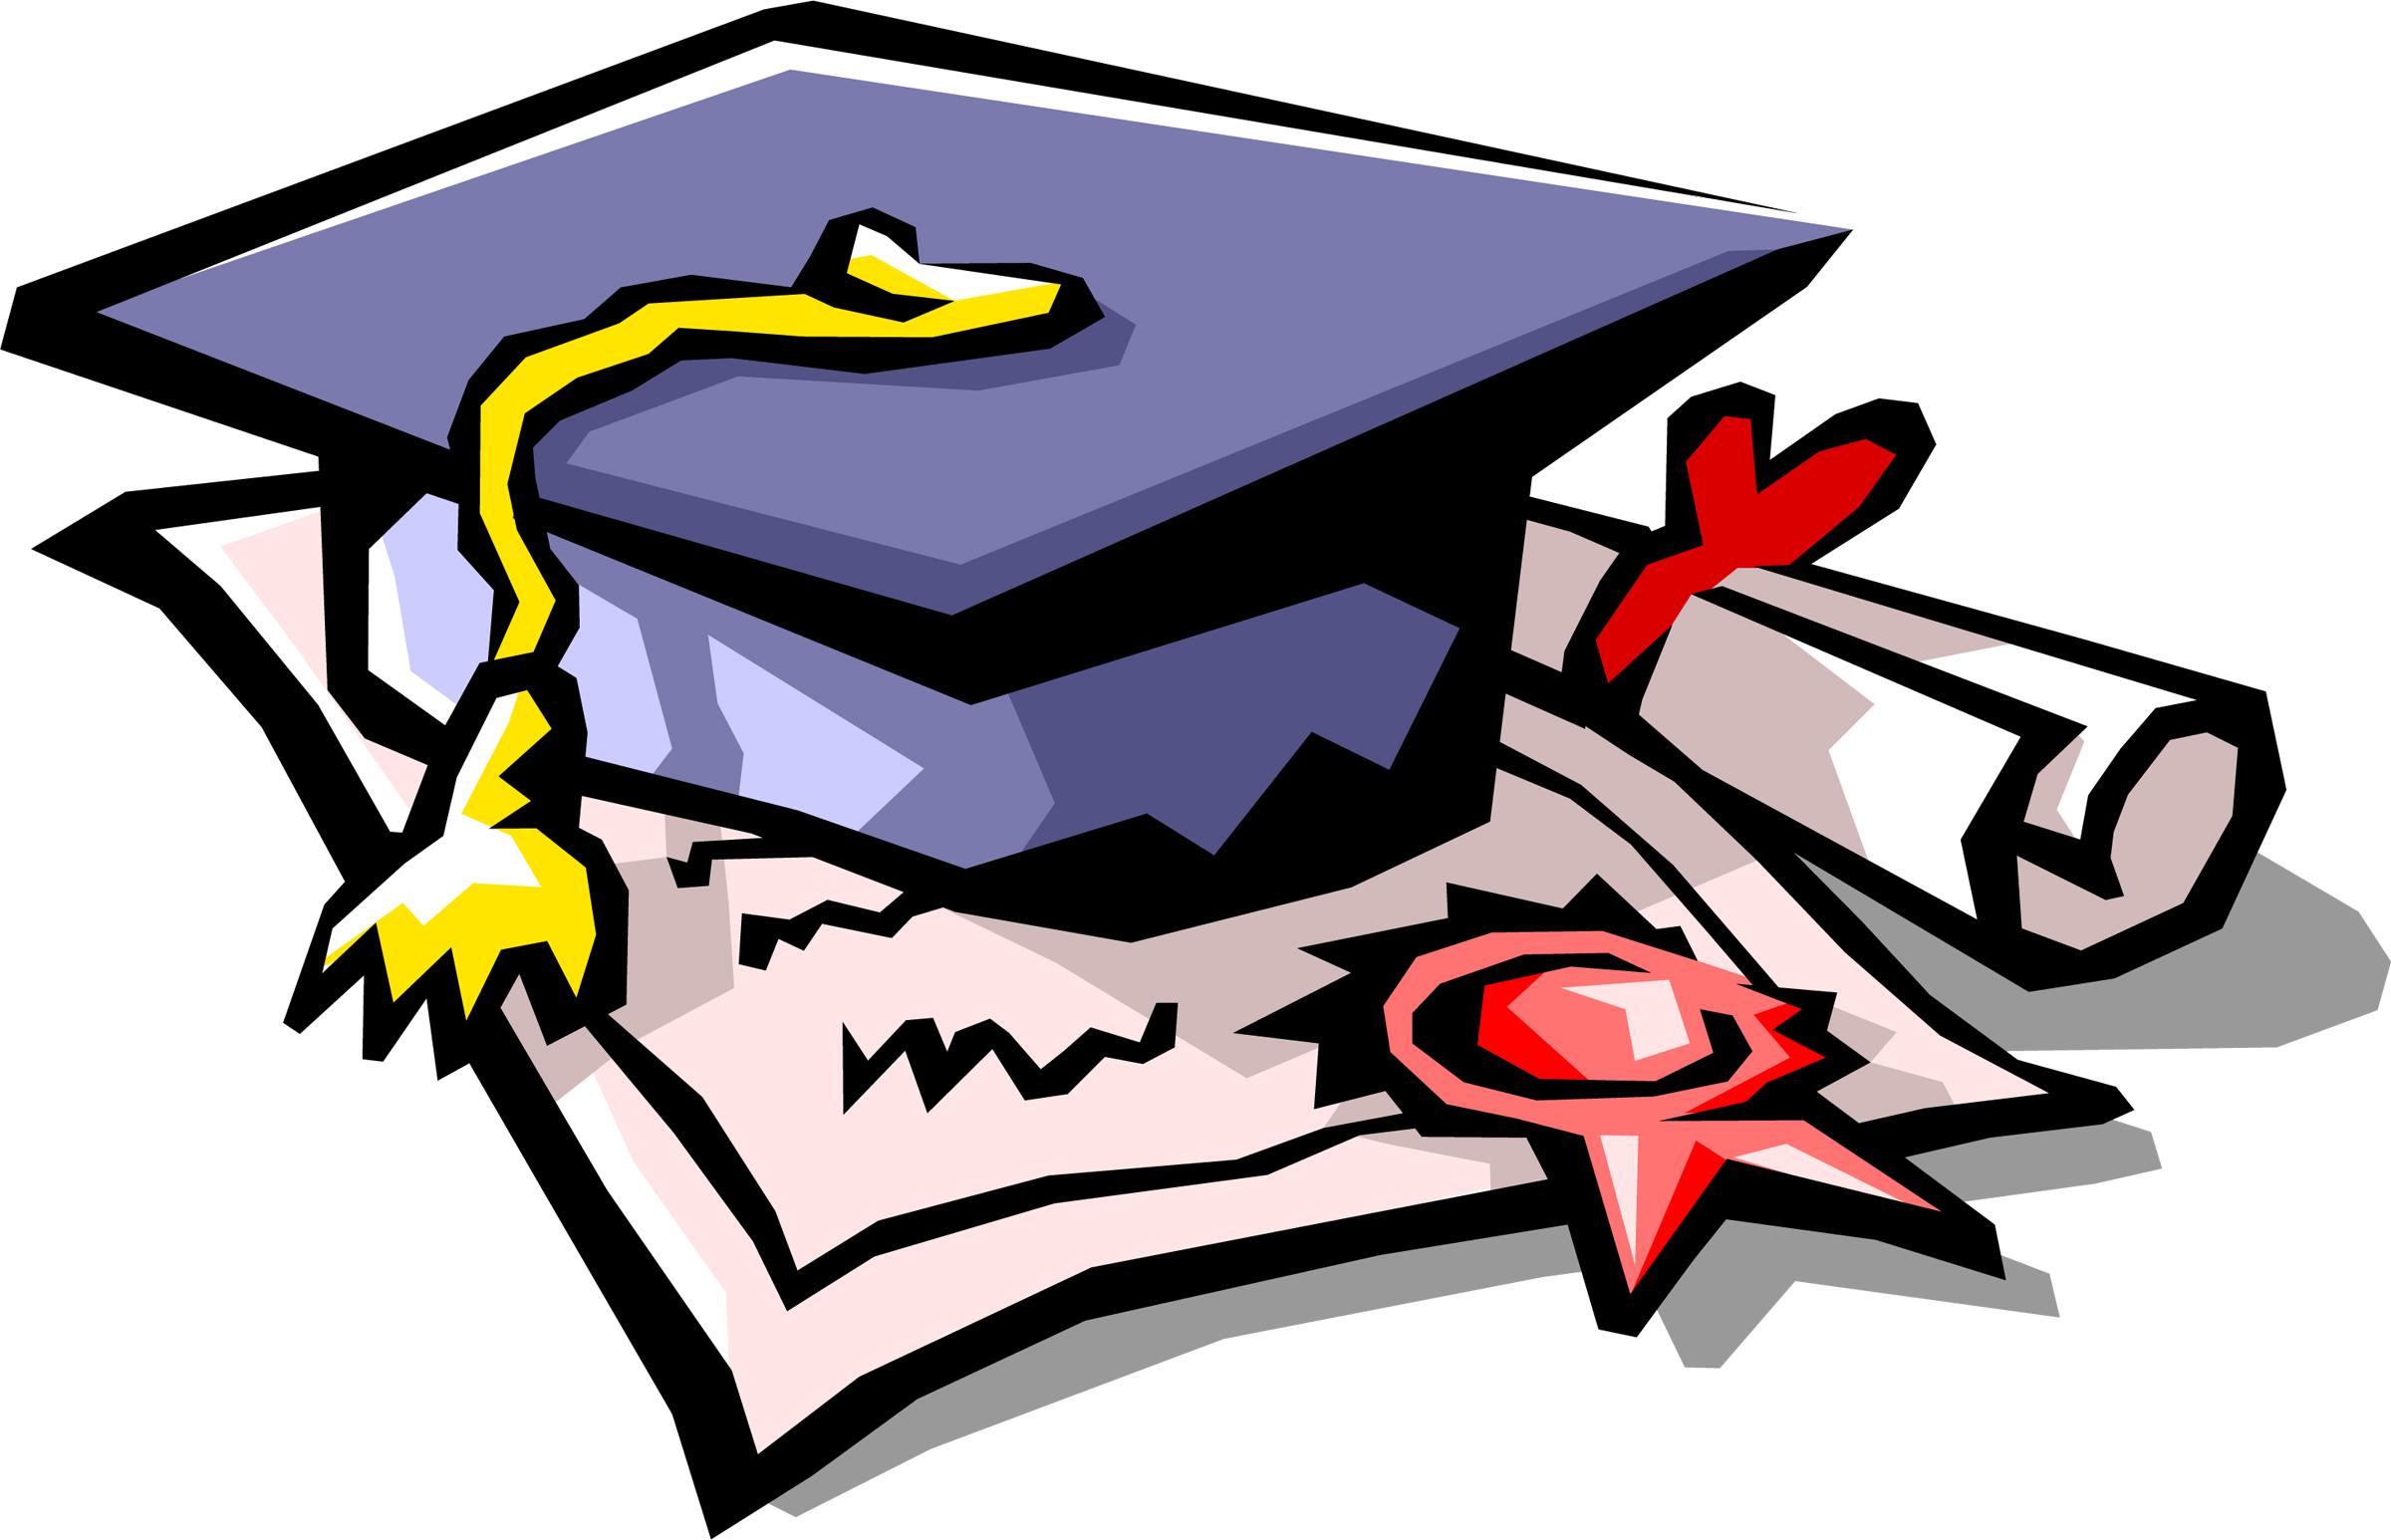 Free Congratulations Graduate Cliparts, Download Free Clip Art, Free ... clipart freeuse